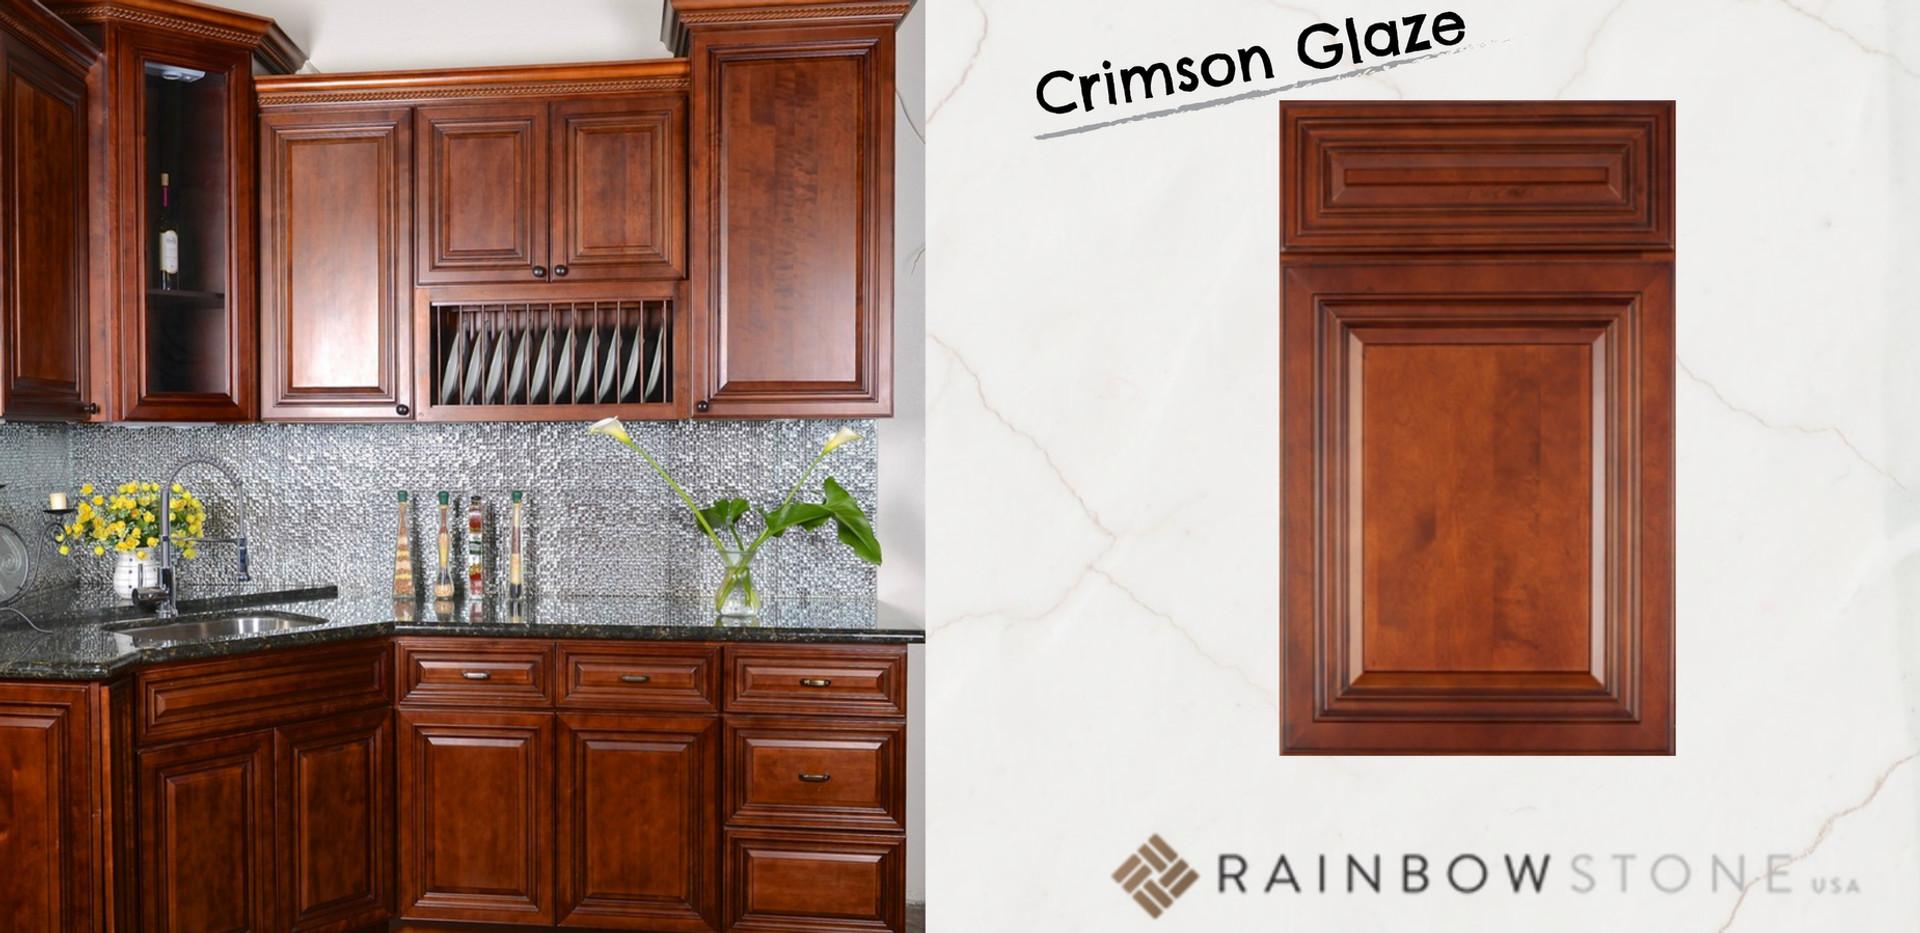 Crimson Glaze TK Slide.jpg